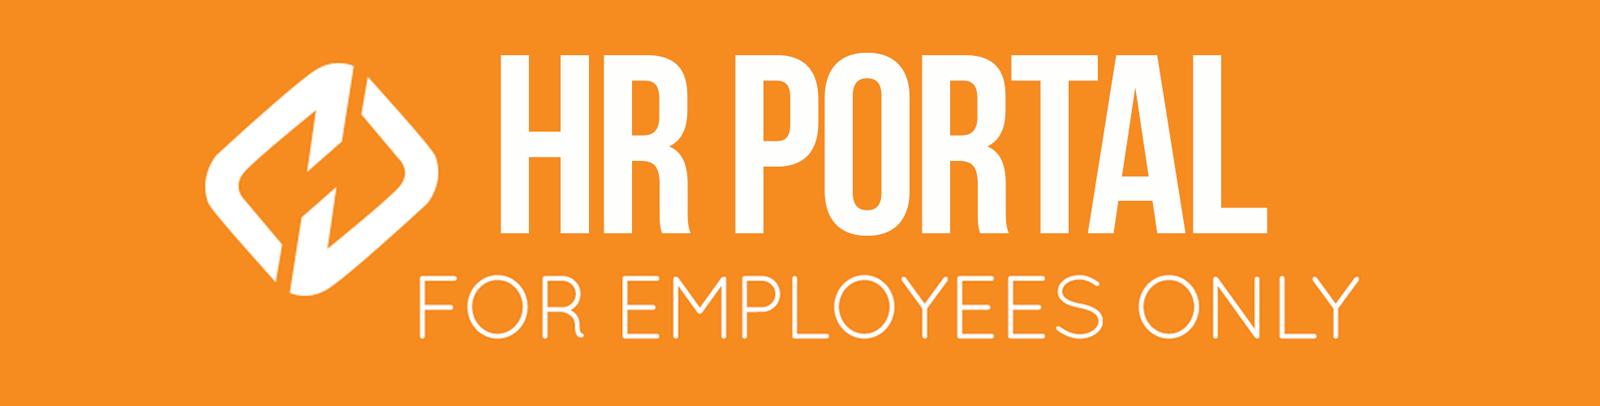 HR-PORTAL-1 Careers